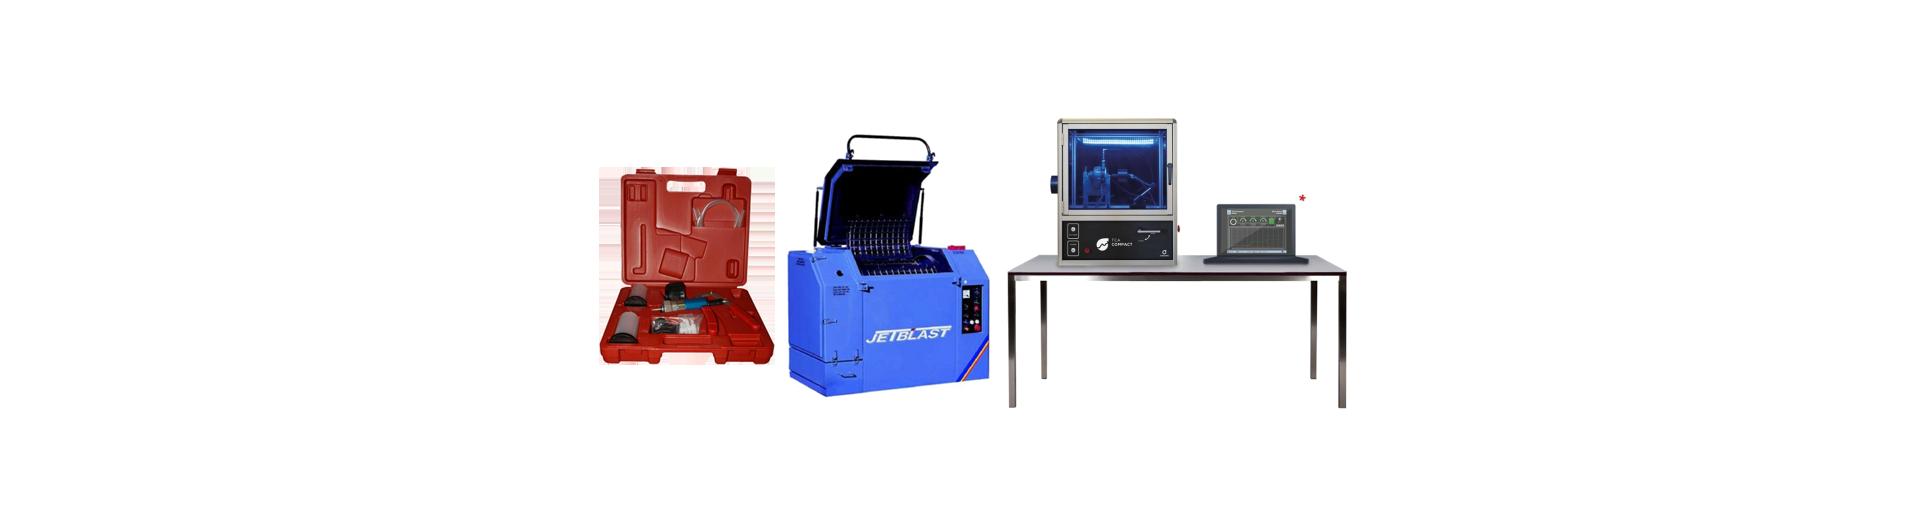 Equipment turbo UK - Buy turbocharger tools